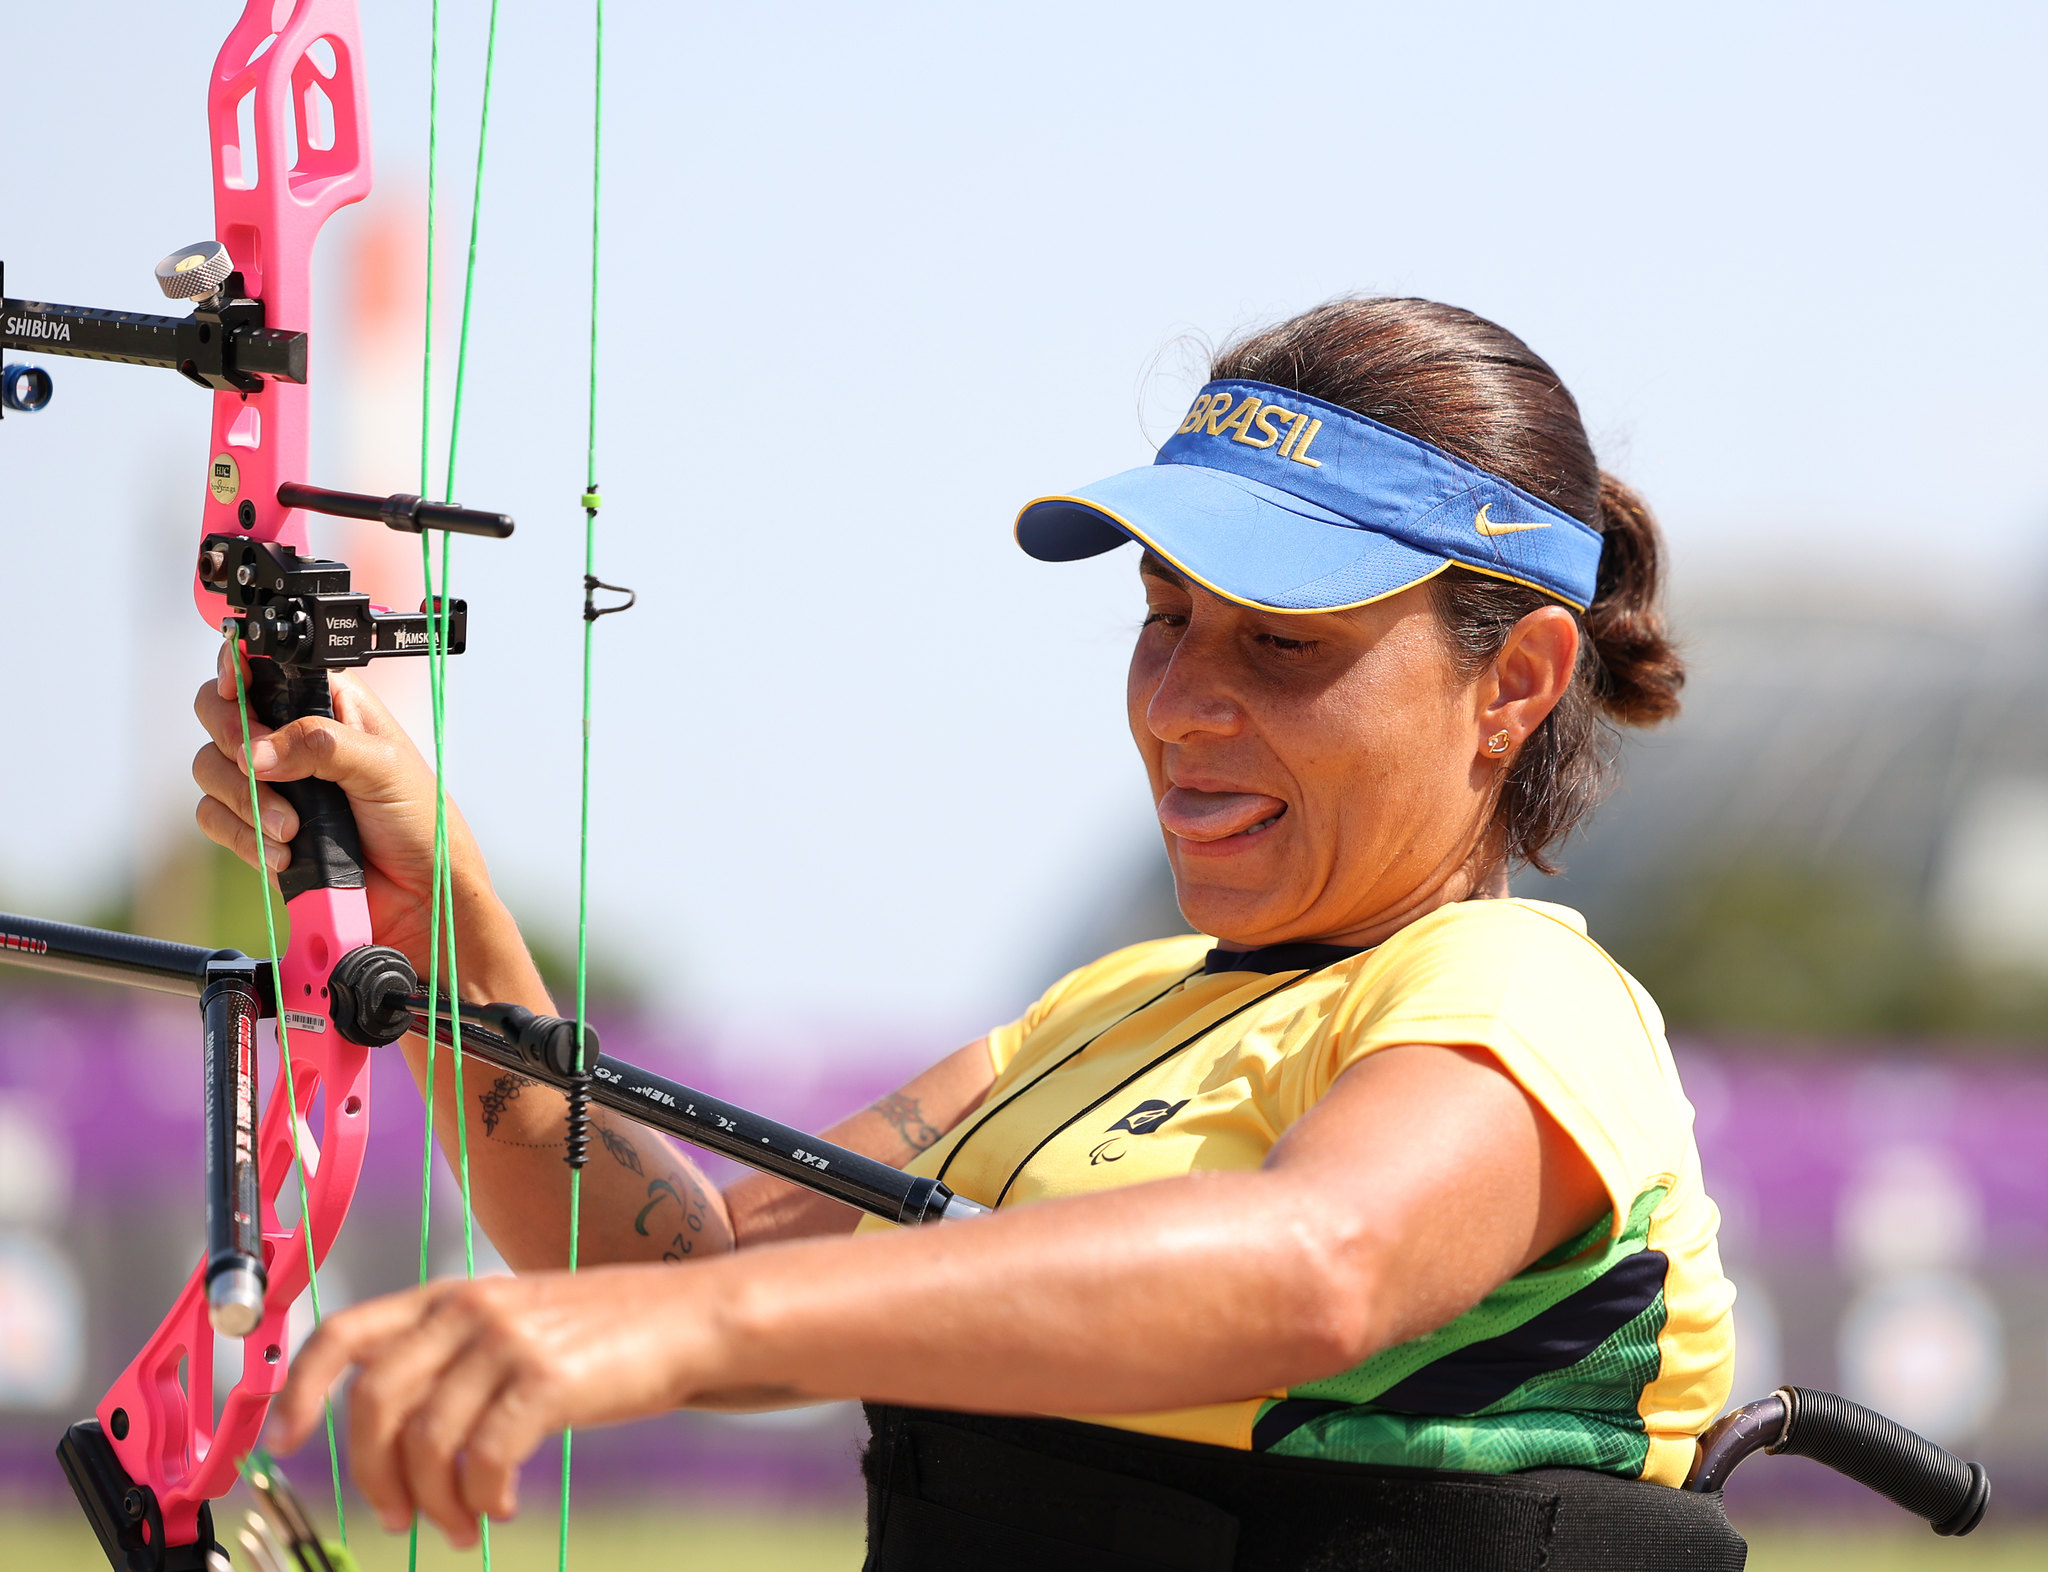 Rejane Candida da Silva mostra a língua e prepara arco e flecha